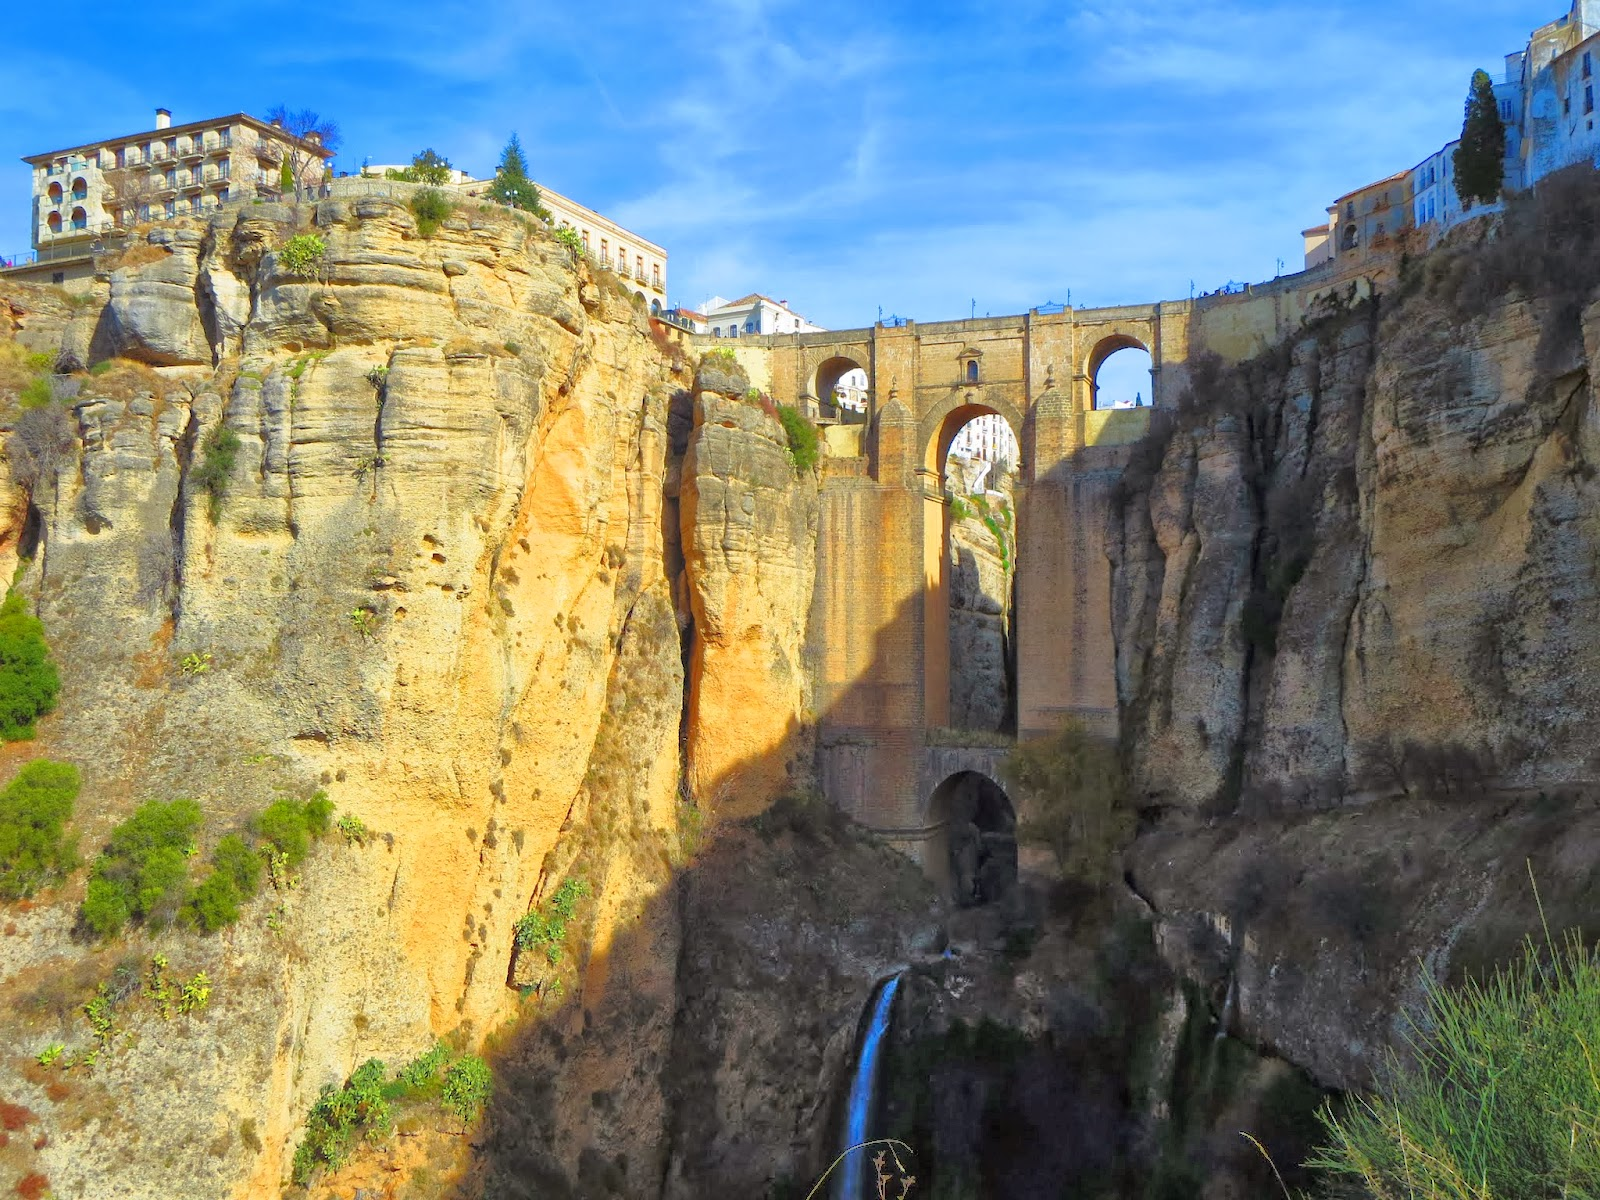 The New Bridge in Ronda, Spain